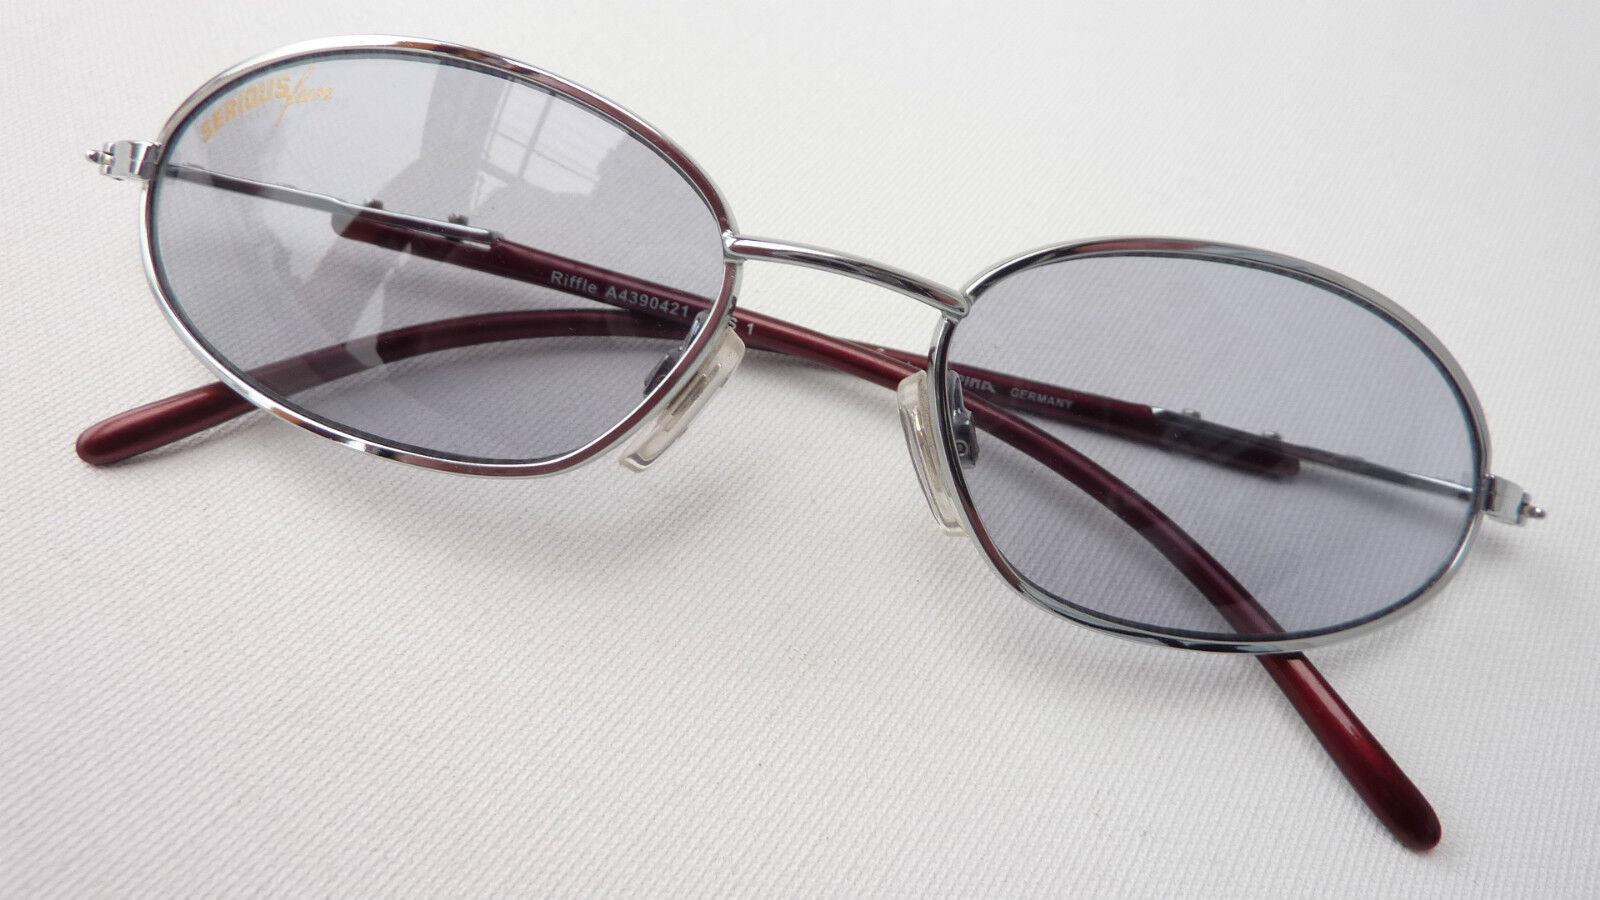 Alpina Curved Sunglasses Sport-Brille Metal Silver Shoppingbrille Size L